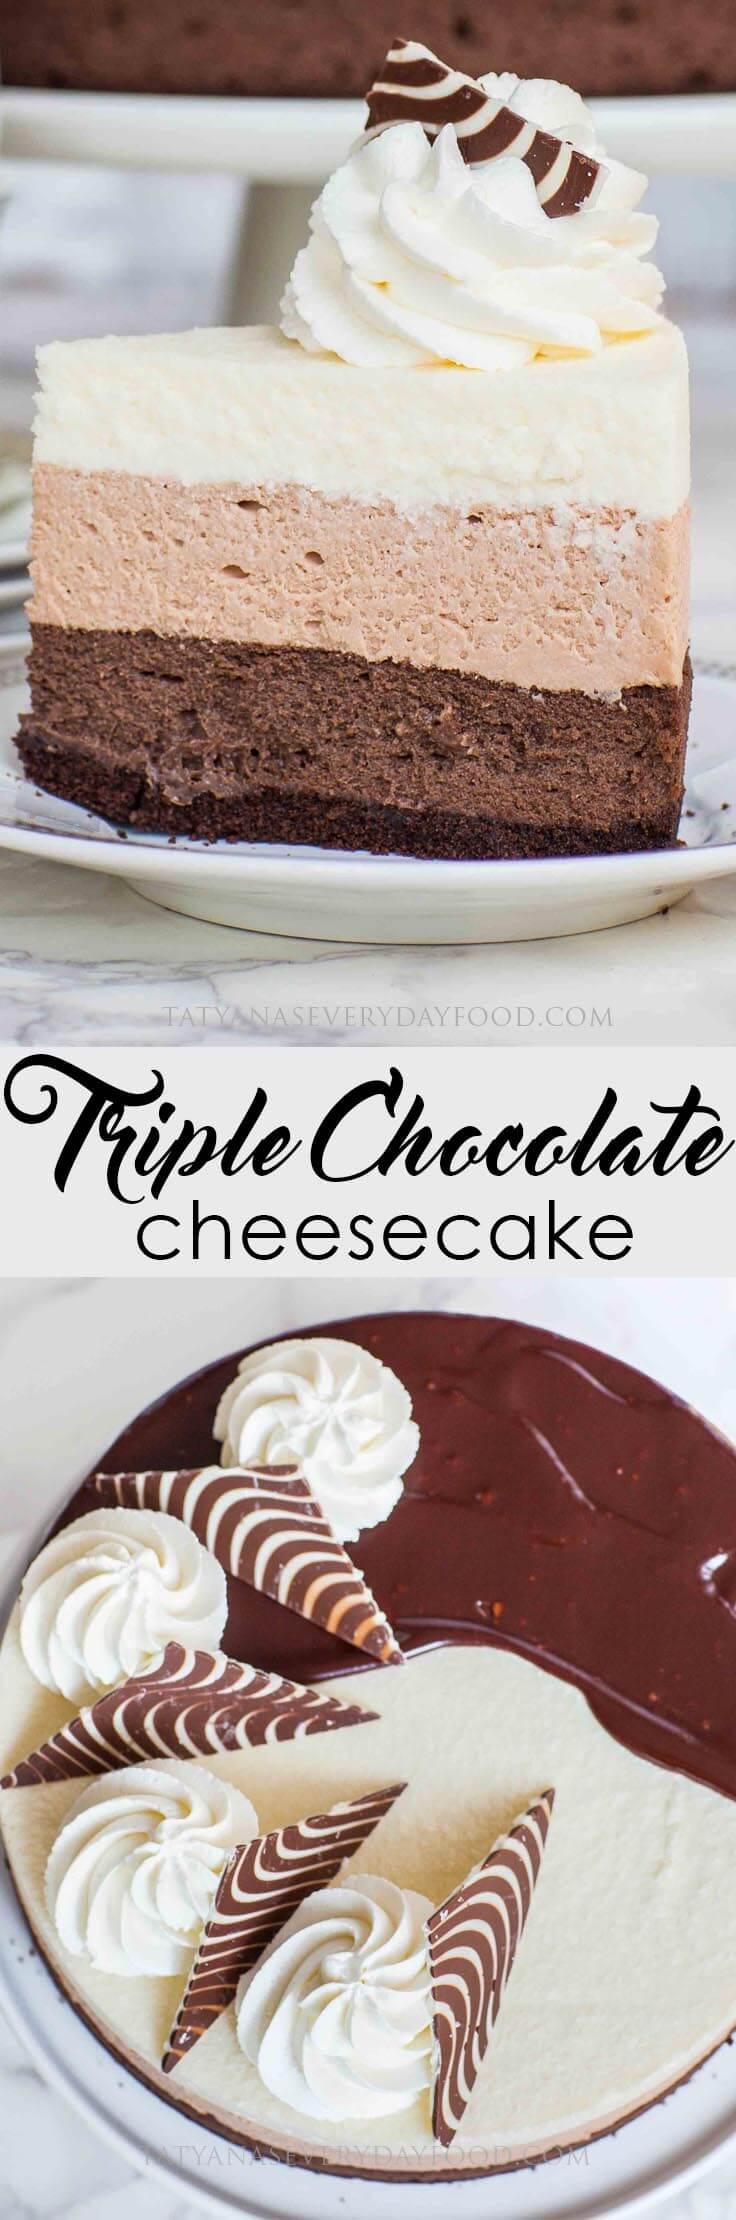 cheesecake video recipe